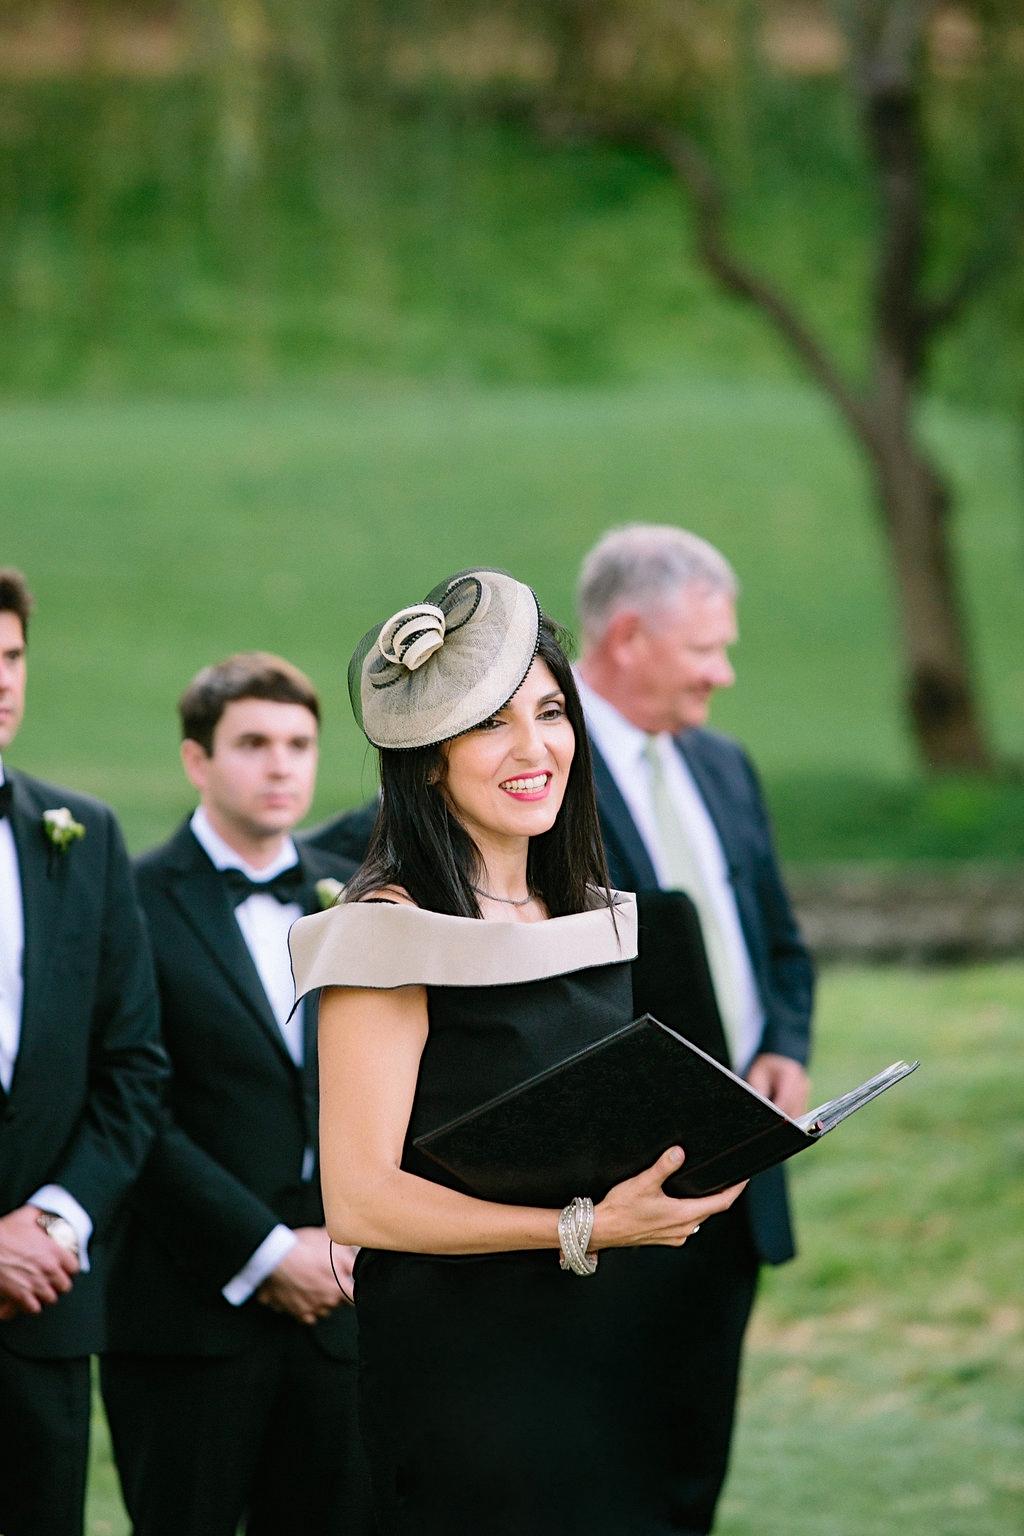 Katlin&Nawder-Ceremony-LindsayMaddenPhotography-65.jpg